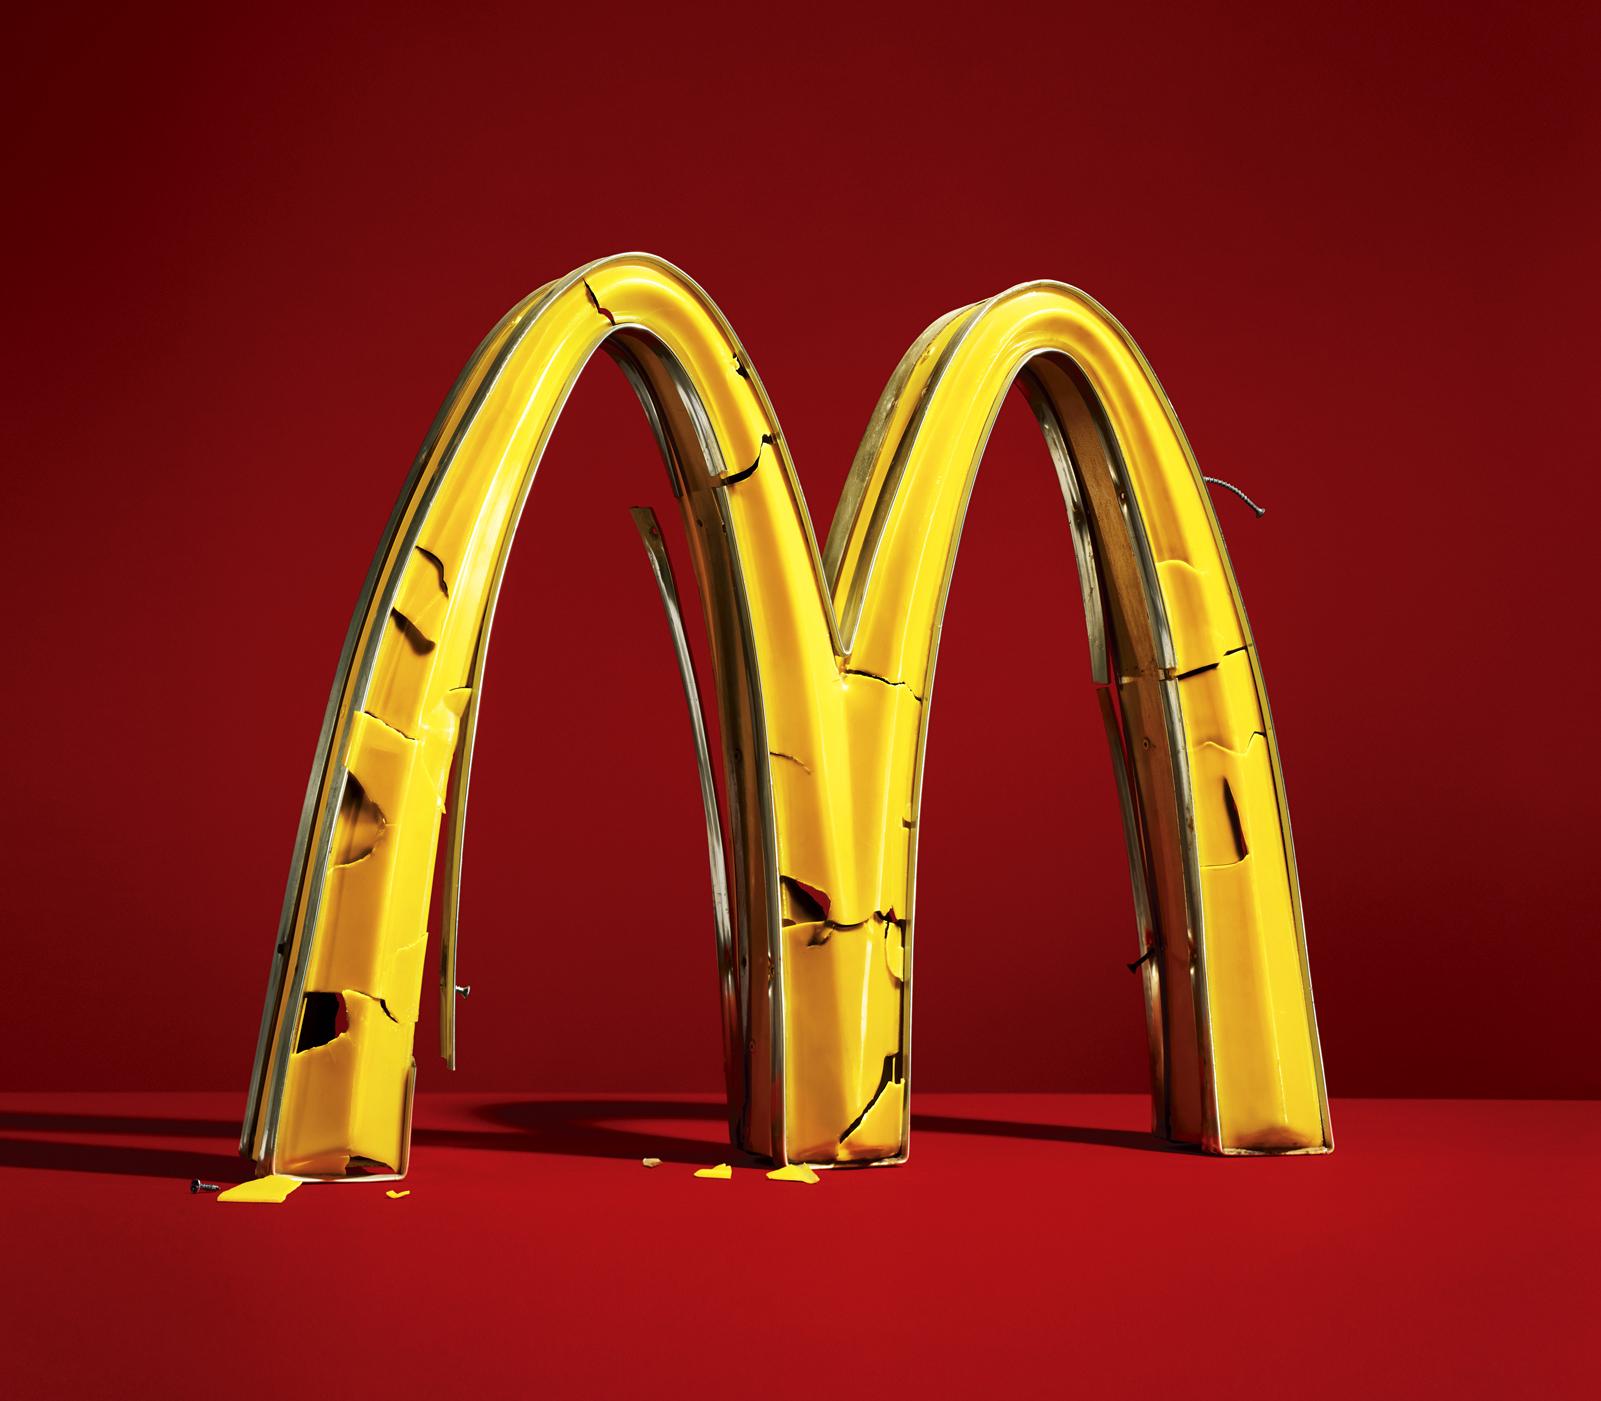 Fallen Arches, broken McDonalds arches